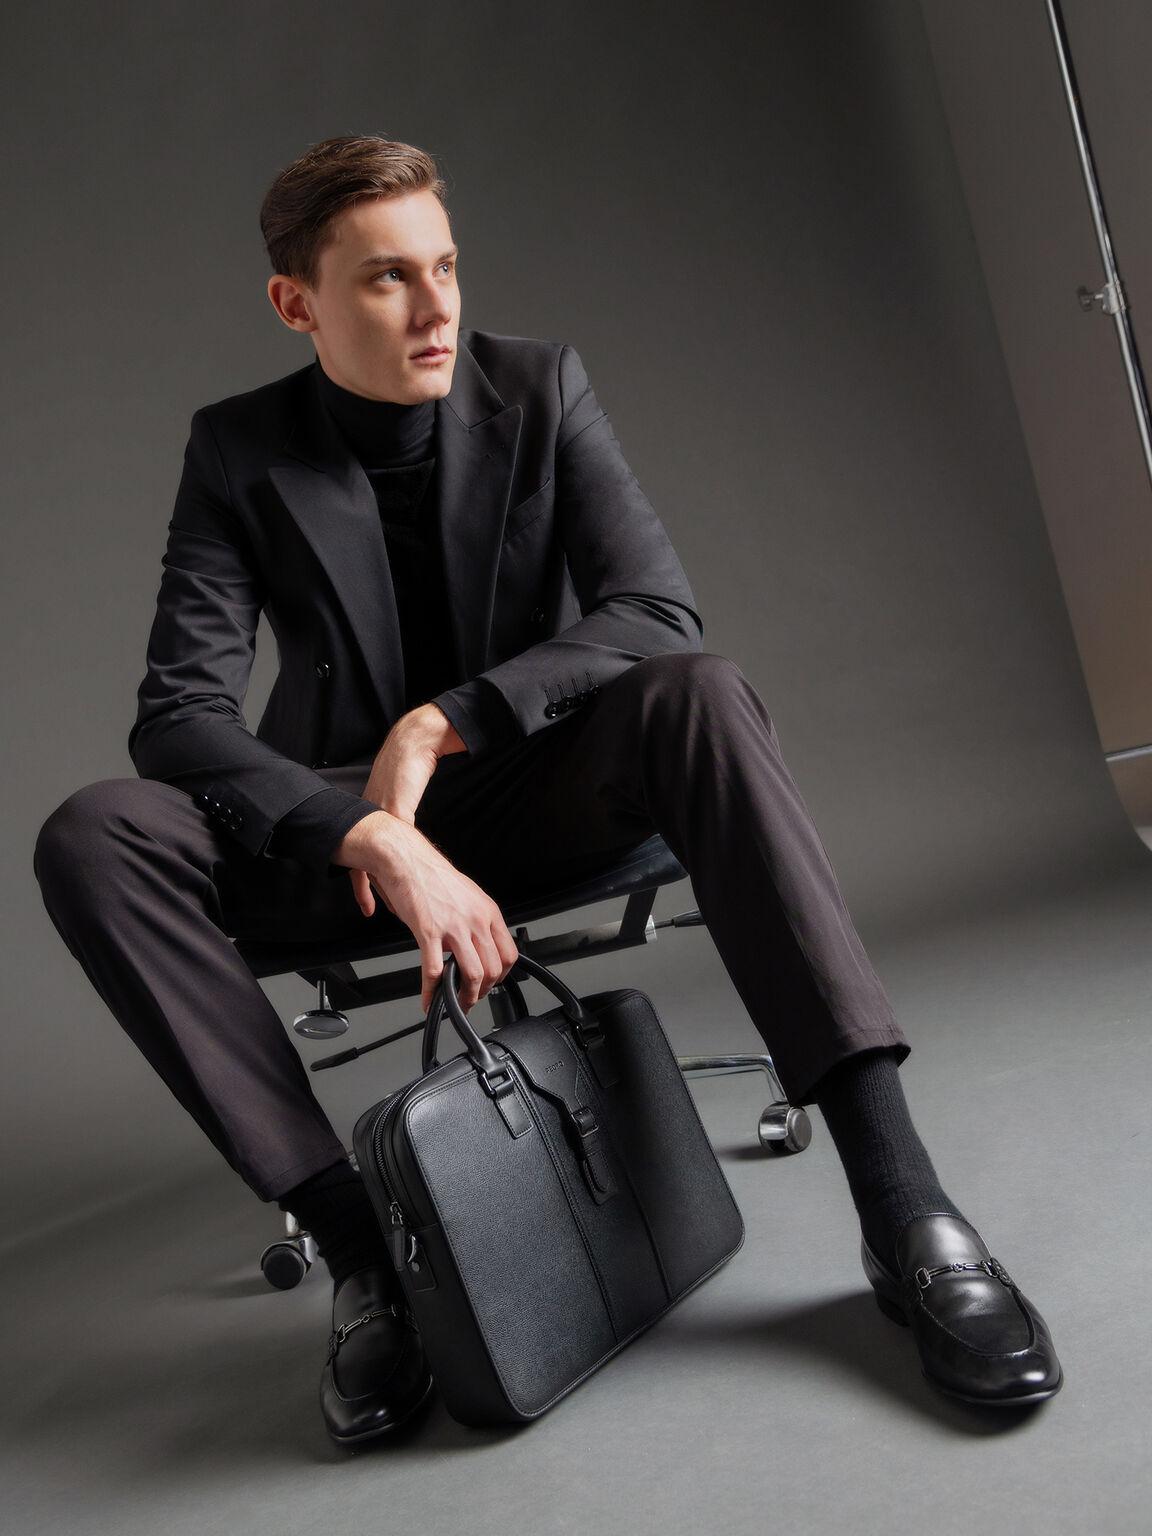 Burnished Leather Loafers with Bit Detailing, Black, hi-res